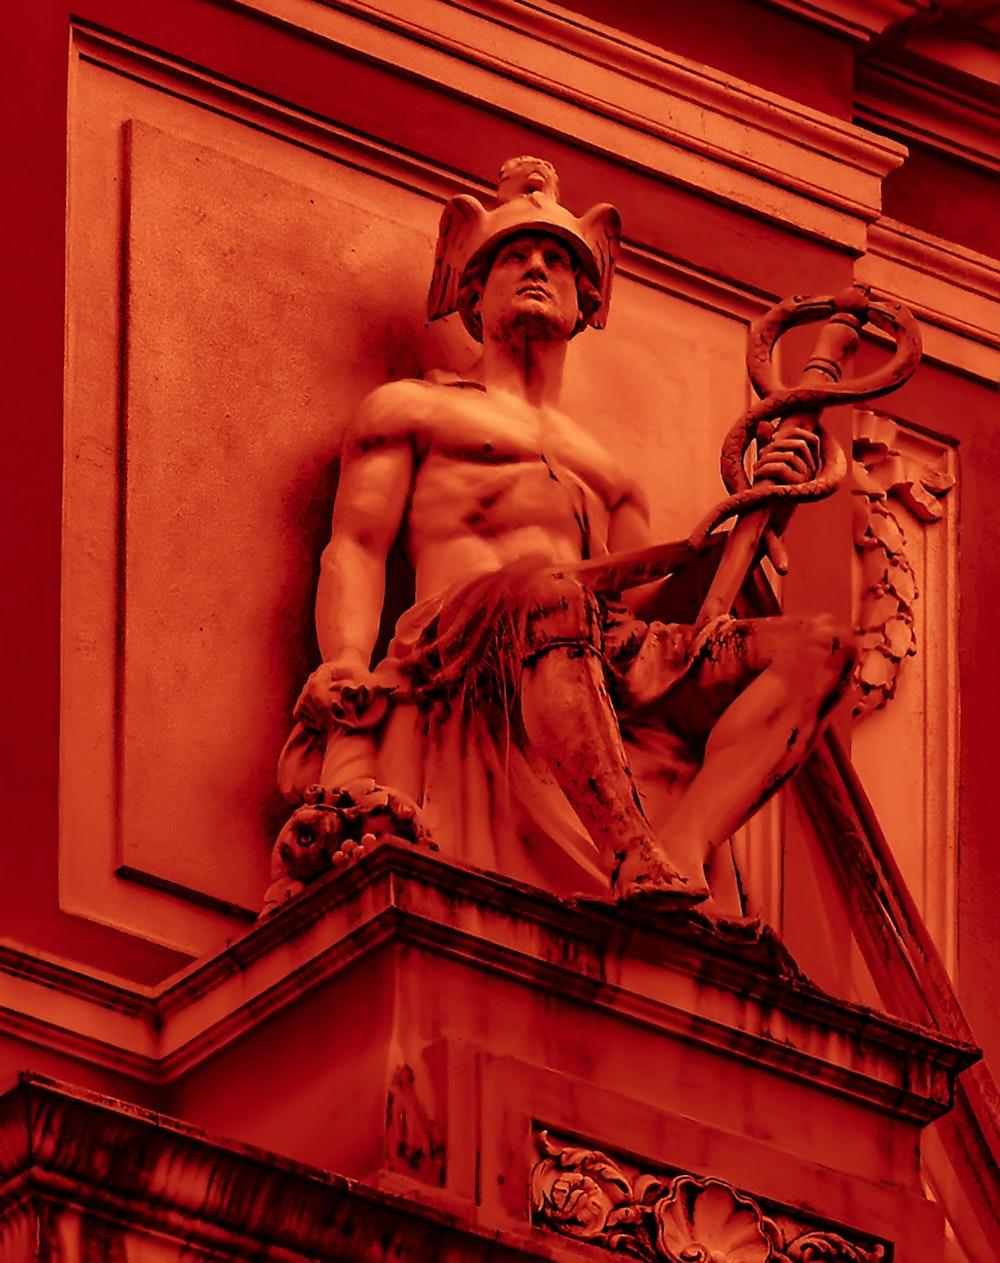 man holding rod statue